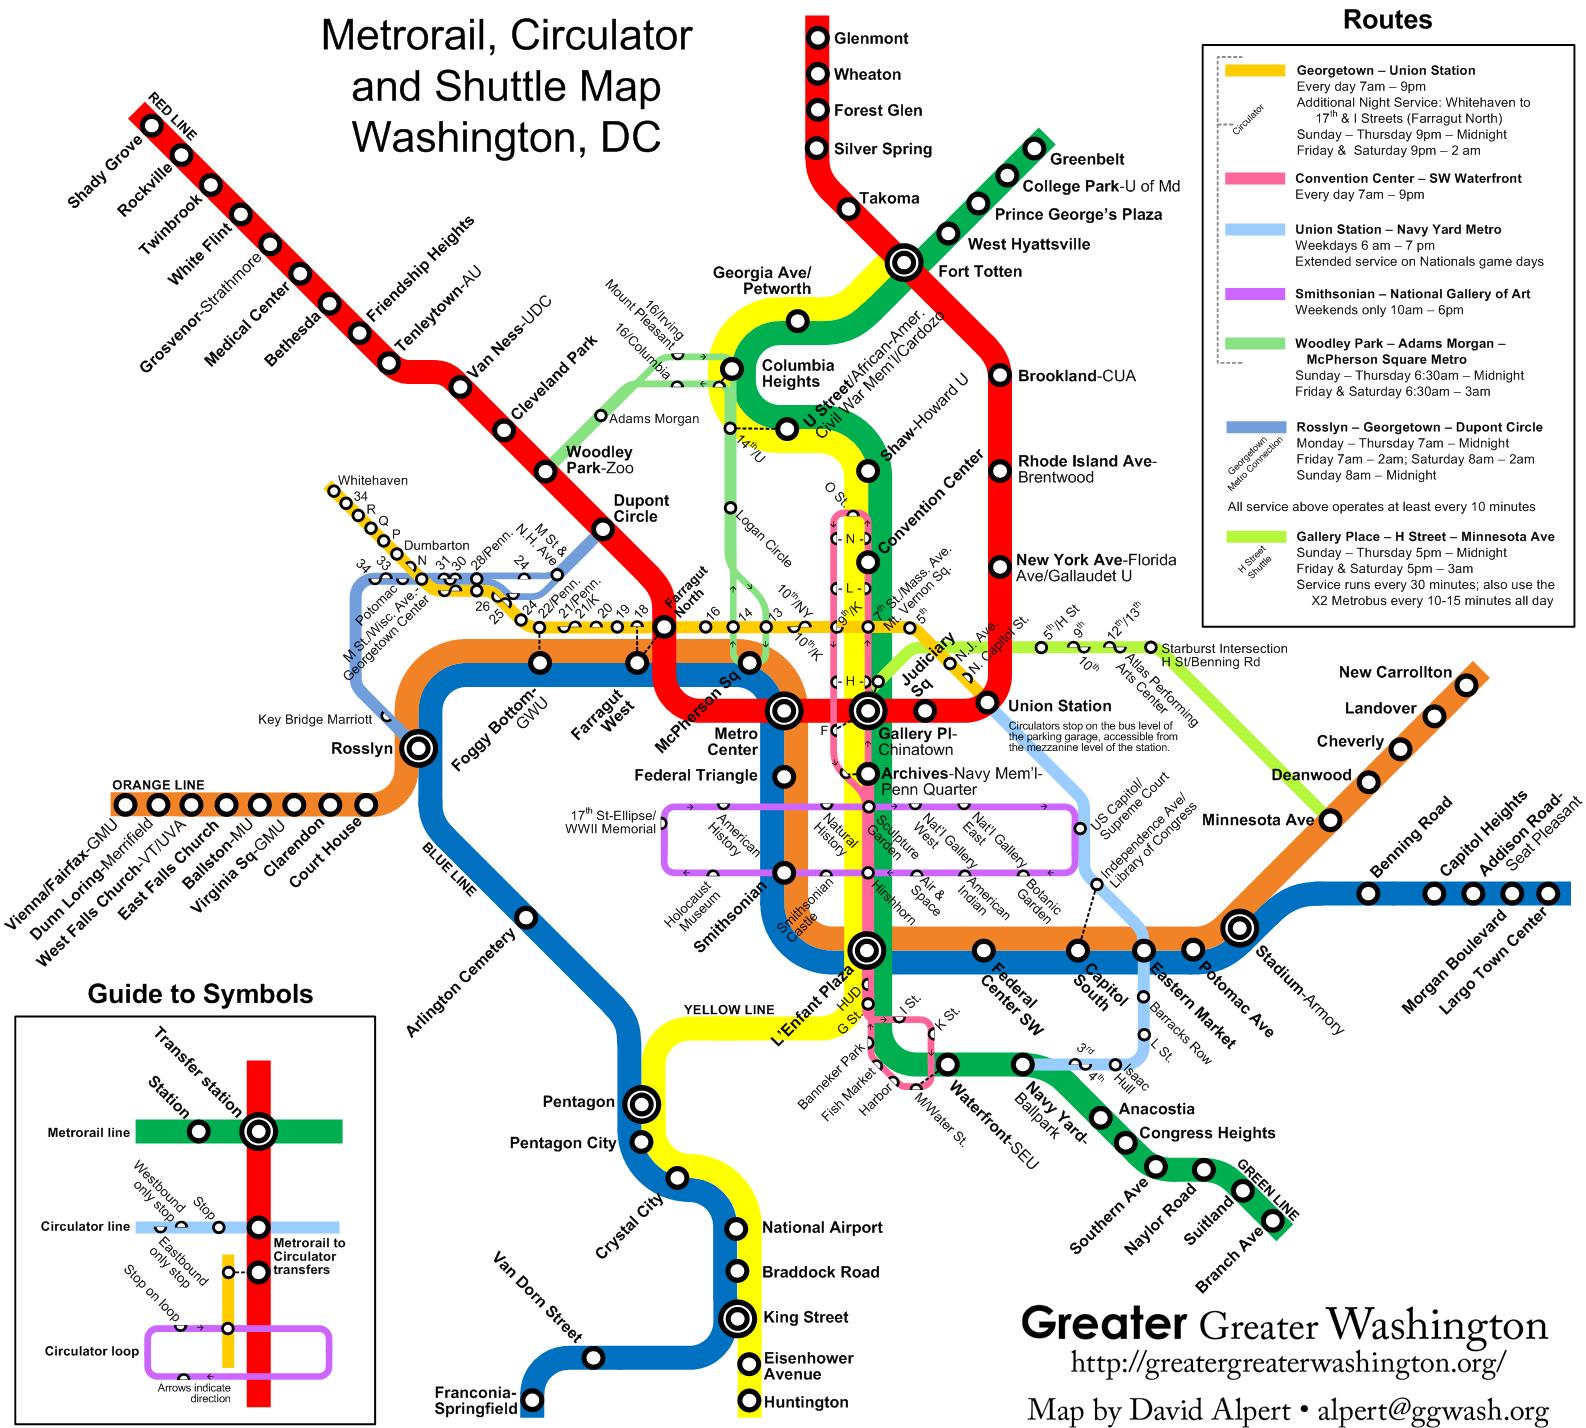 Printable Dc Metro Map in 2020 | Washington metro map, Metro ... on local map, repeater map, fan map, mbta orange line map, cta brown line map,